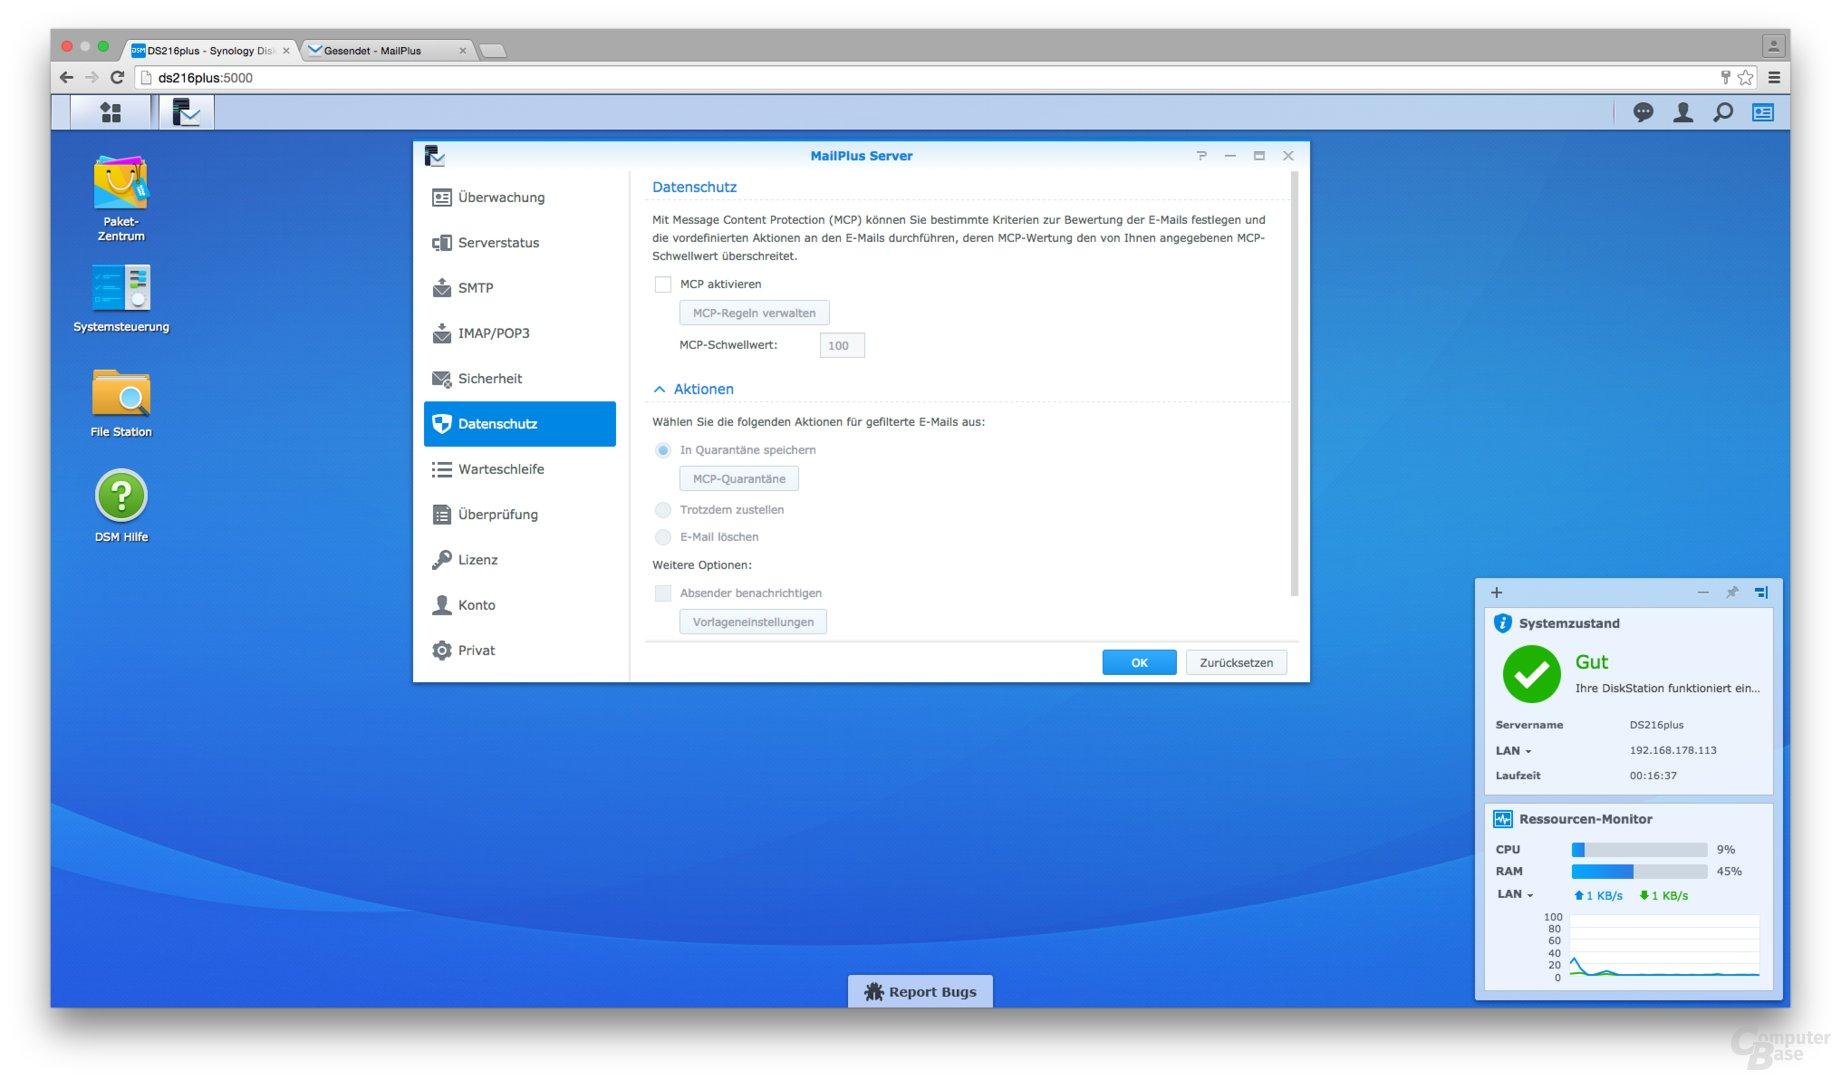 Synology DSM 6.0: MailPlus Server